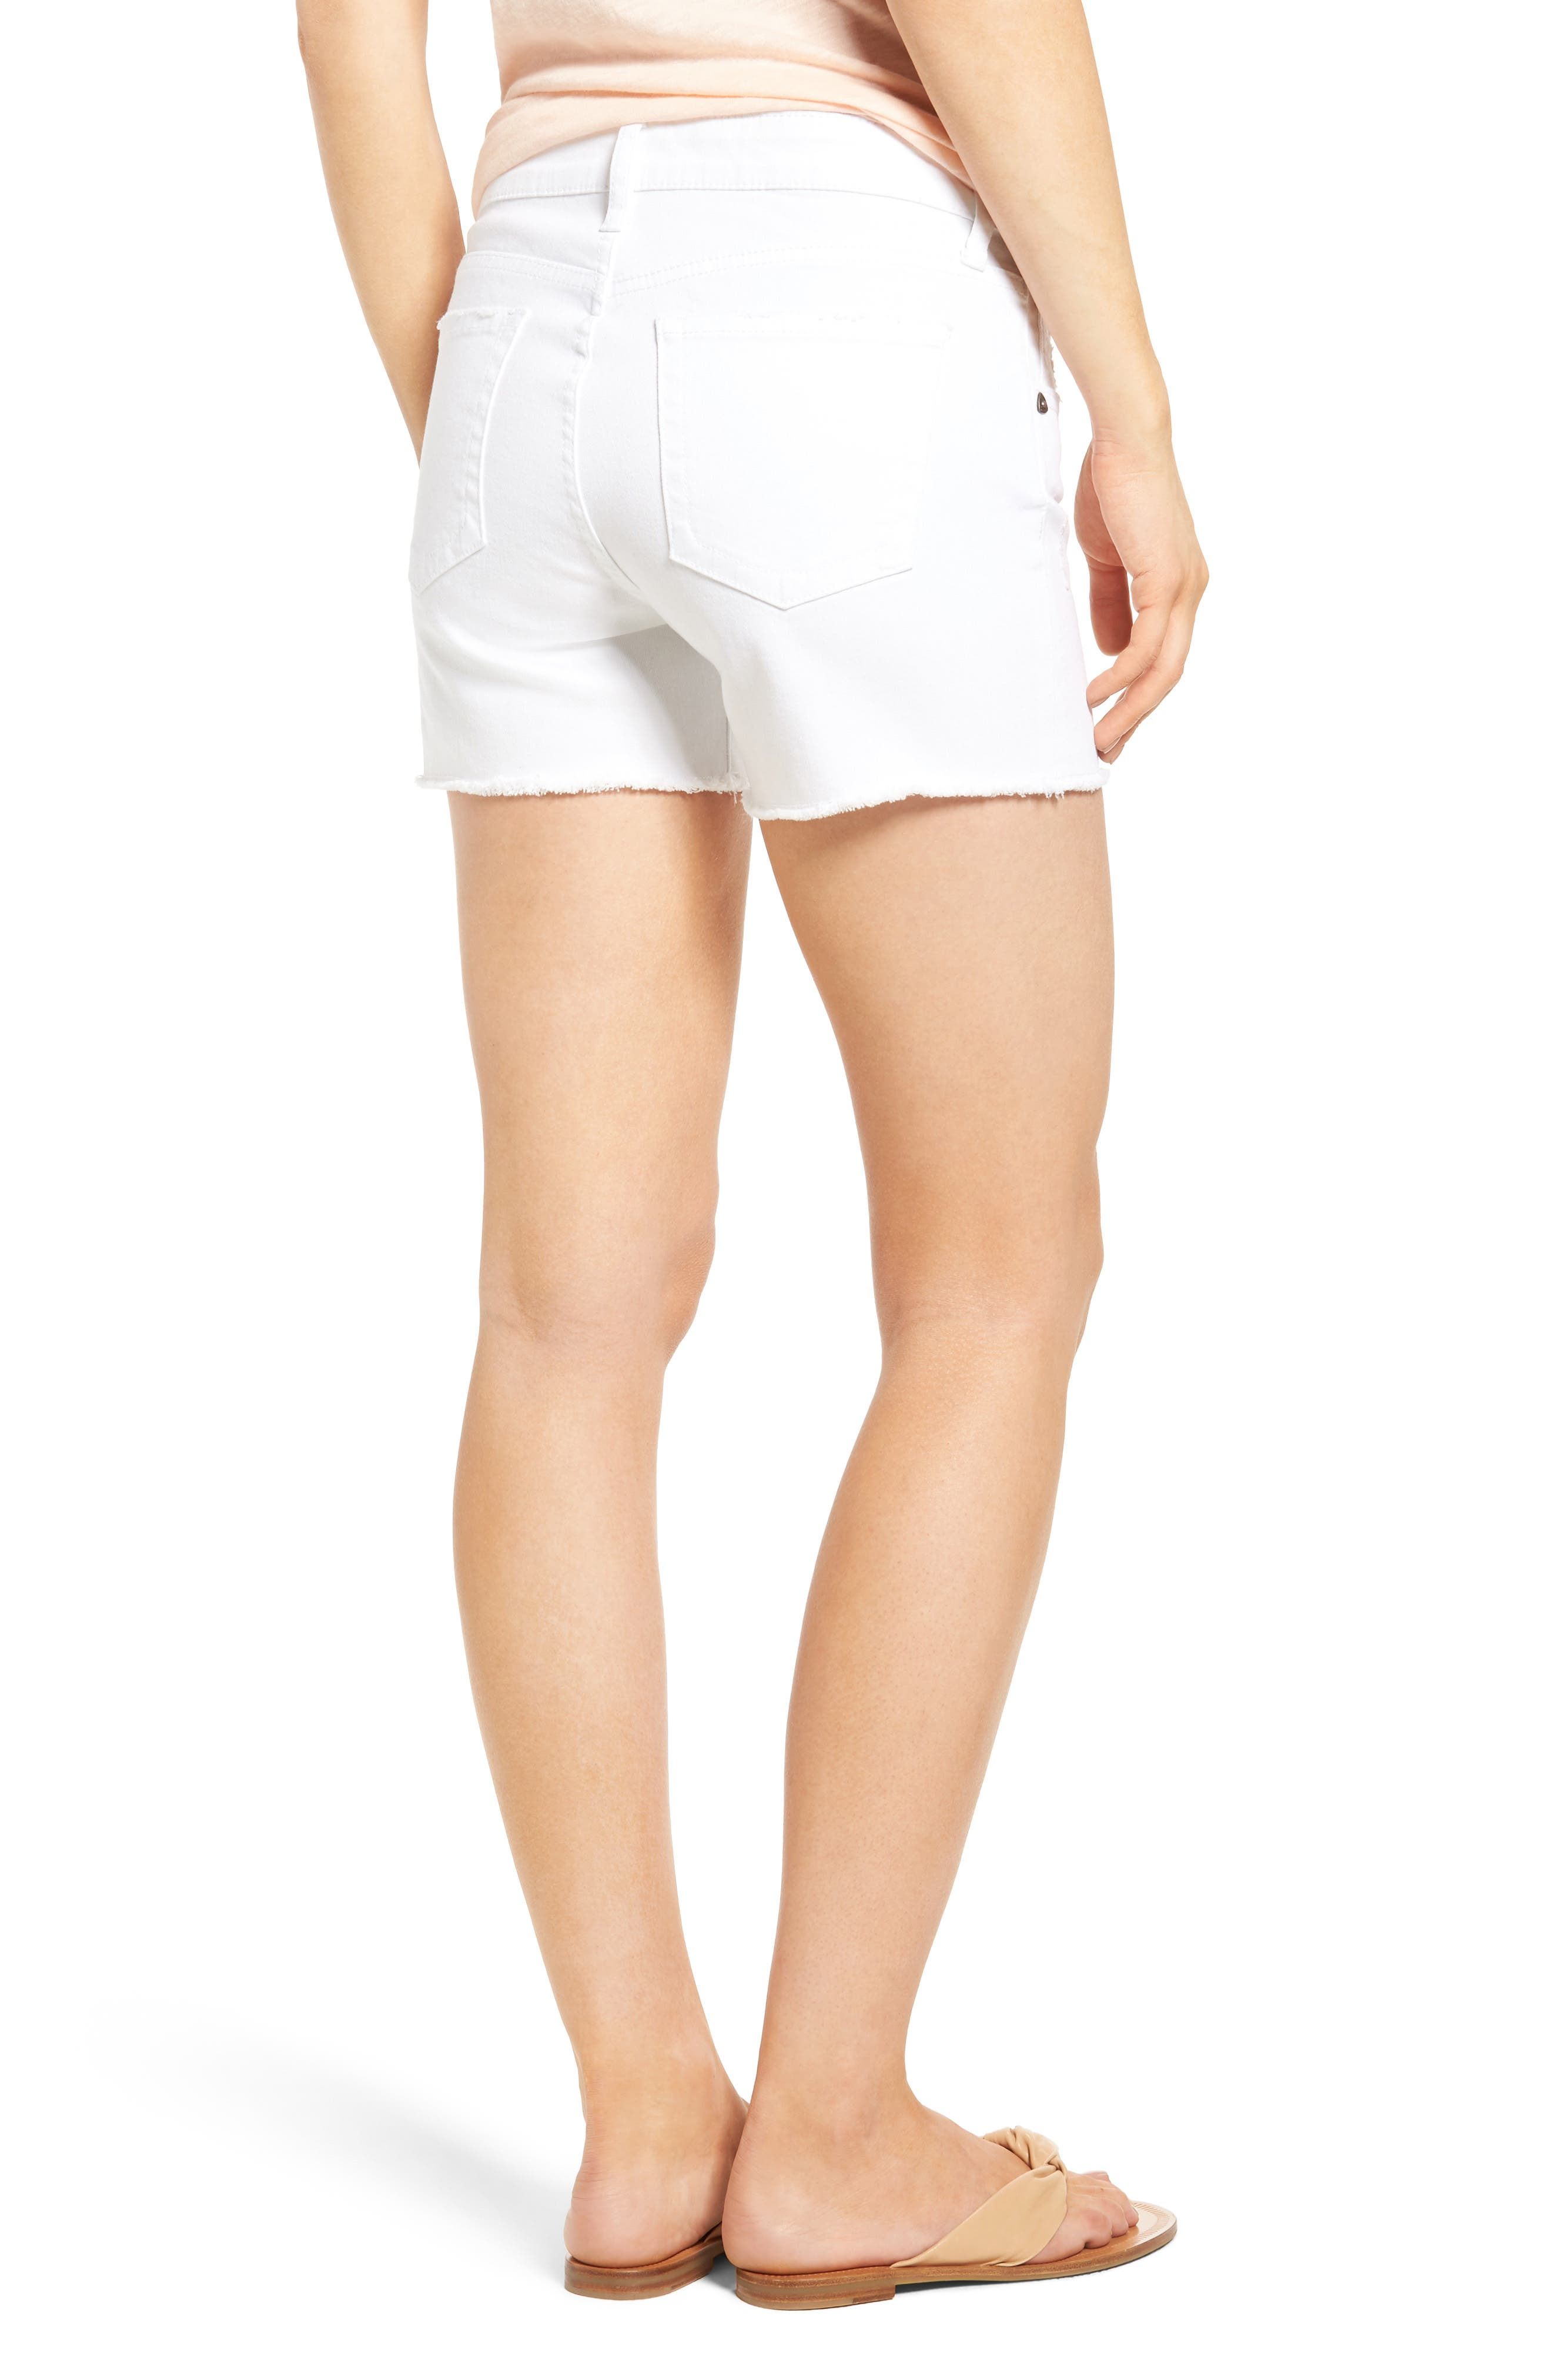 Gidget Denim Shorts,                             Alternate thumbnail 2, color,                             110